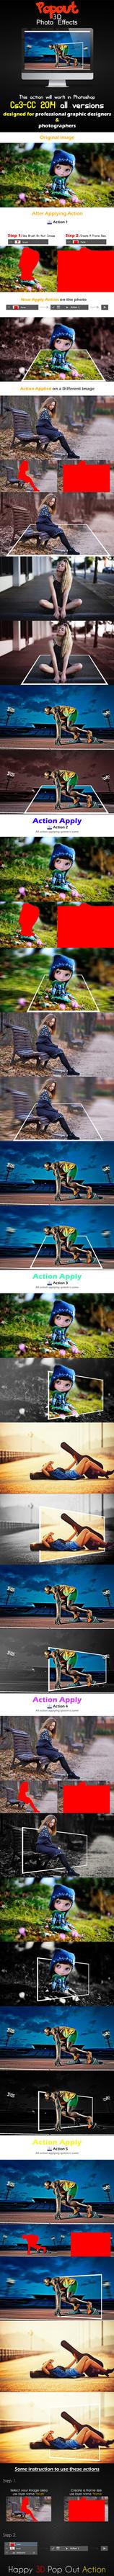 Popout 3D Photo Effects by floriyon